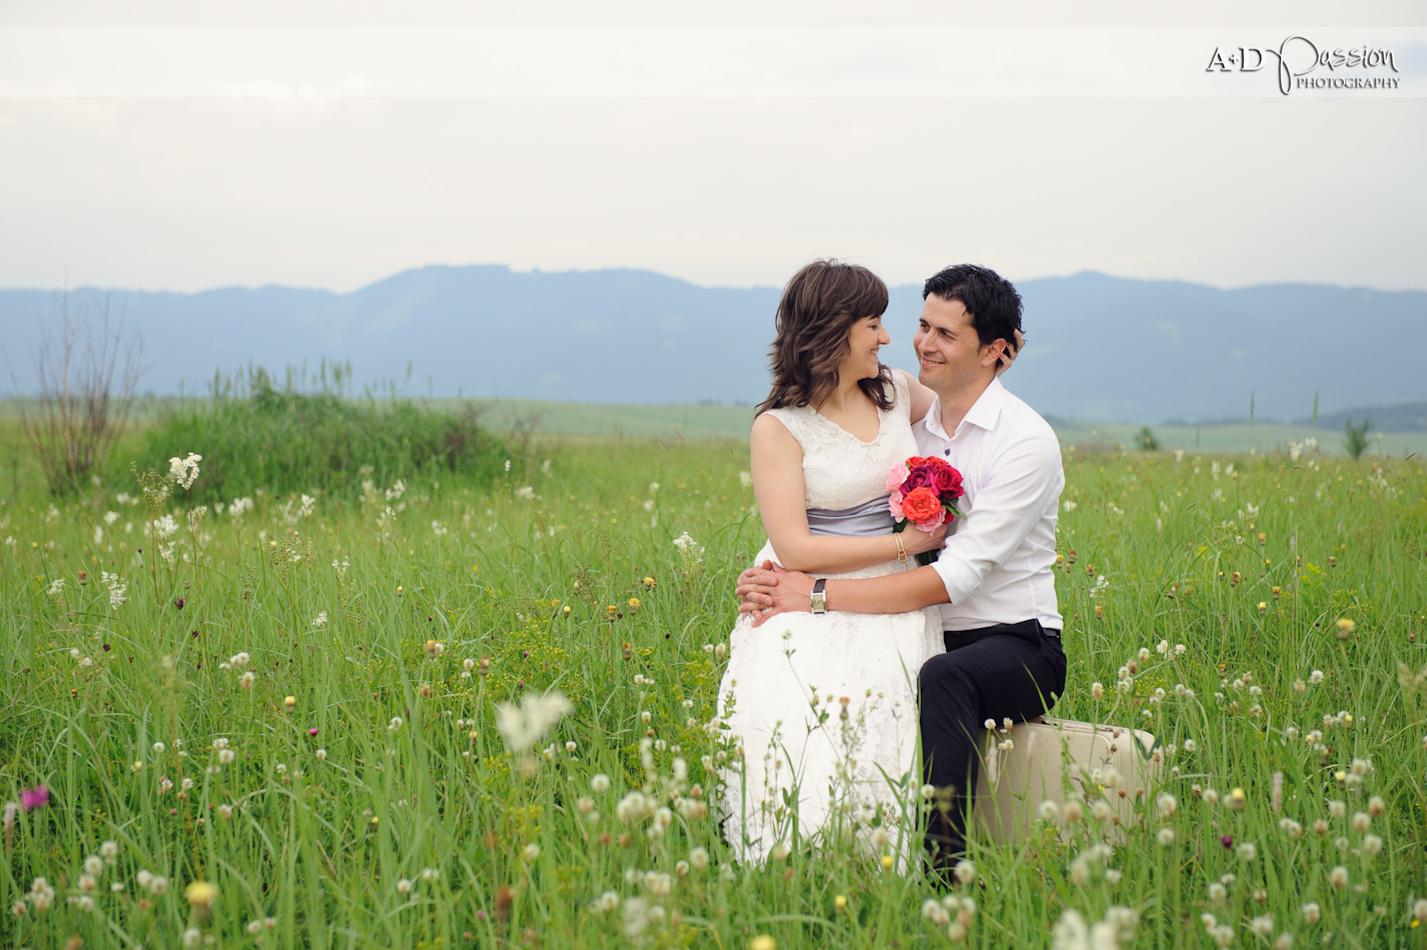 AD Passion Photography | 07042012_fotograf-profesionist-nunta_after-wedding_carmen-si-costi_0026 | Adelin, Dida, fotograf profesionist, fotograf de nunta, fotografie de nunta, fotograf Timisoara, fotograf Craiova, fotograf Bucuresti, fotograf Arad, nunta Timisoara, nunta Arad, nunta Bucuresti, nunta Craiova